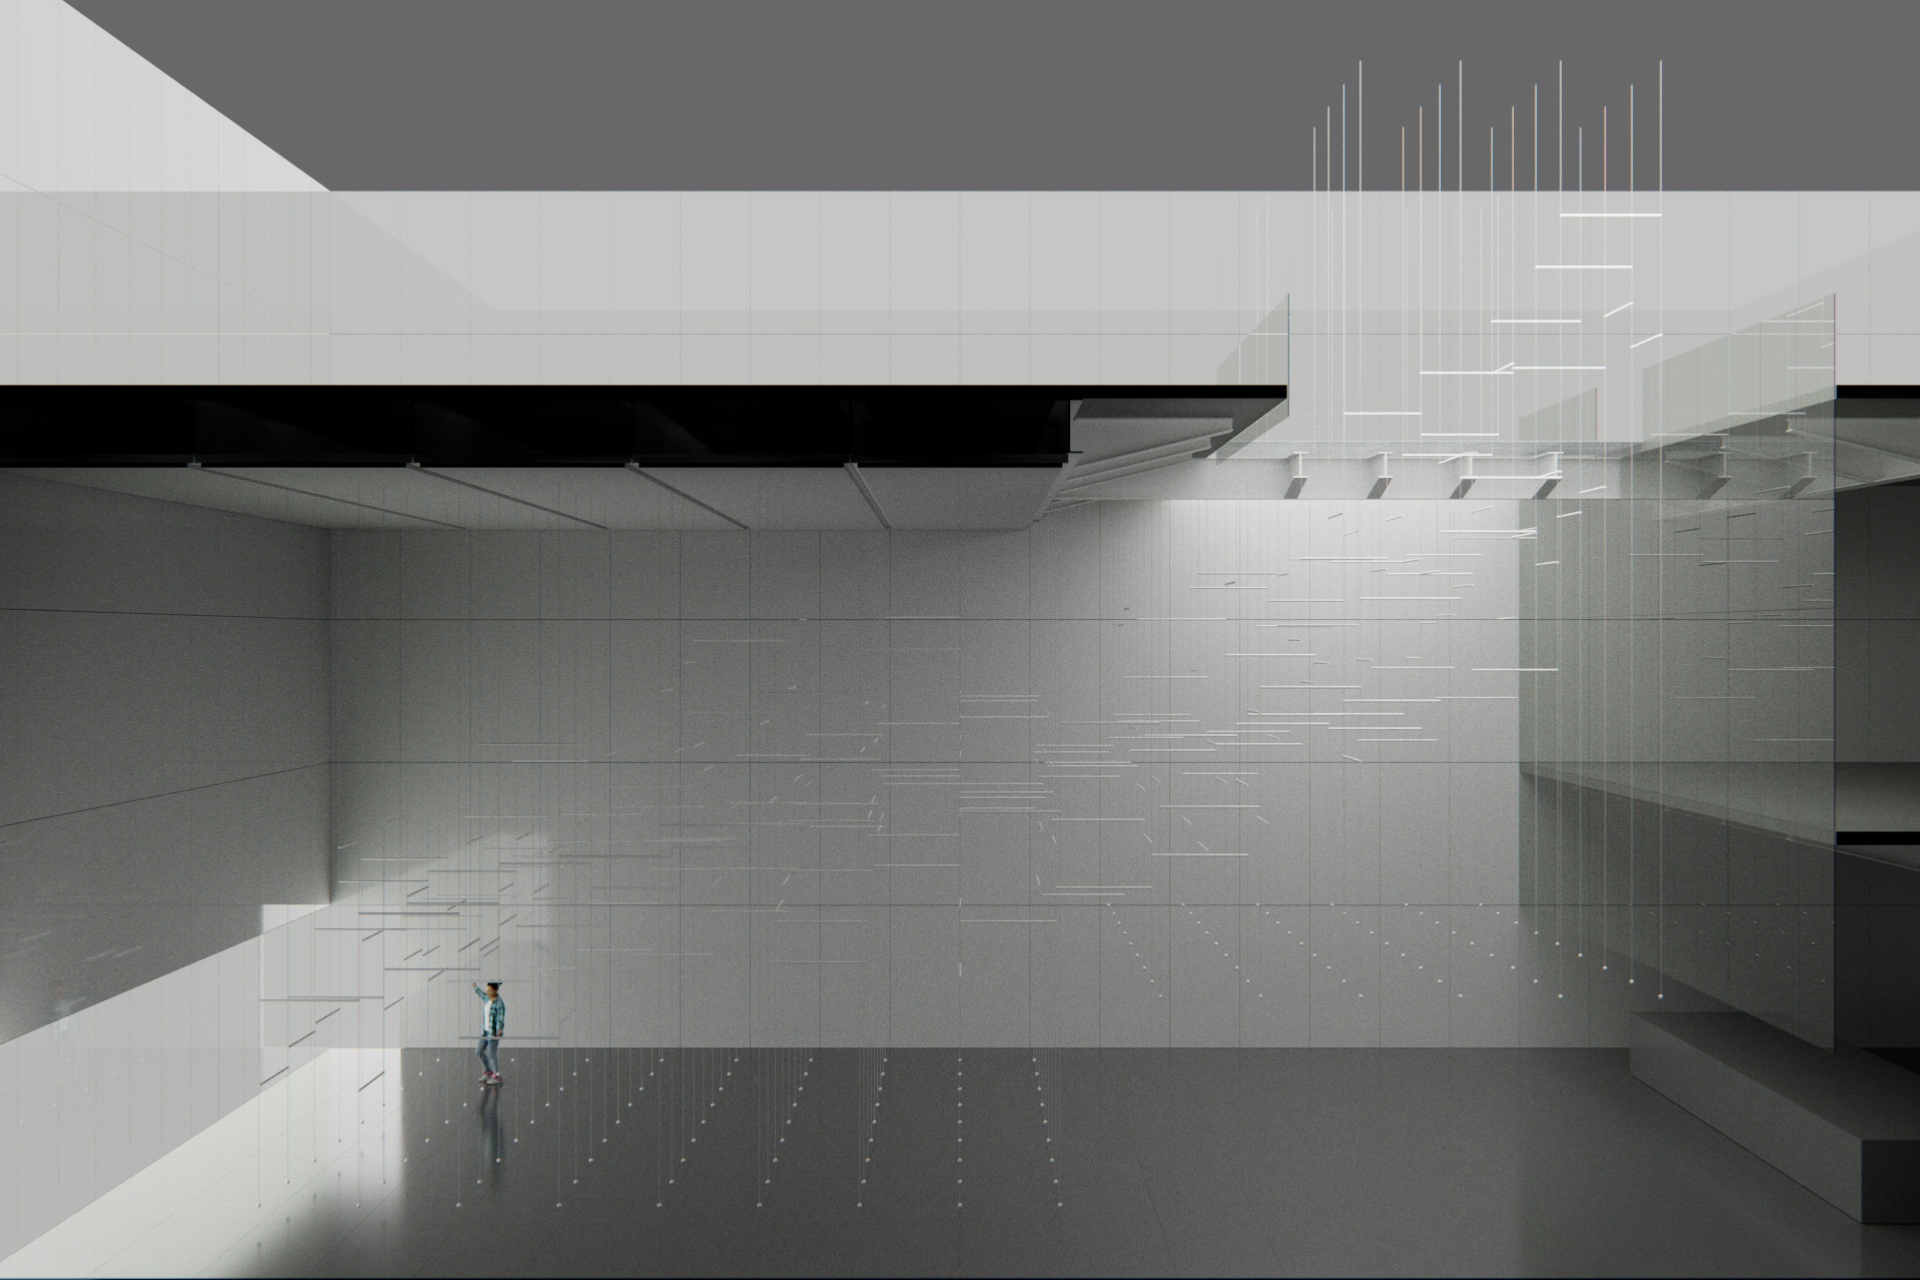 3i019 Site-specific installation at Museo Amparo